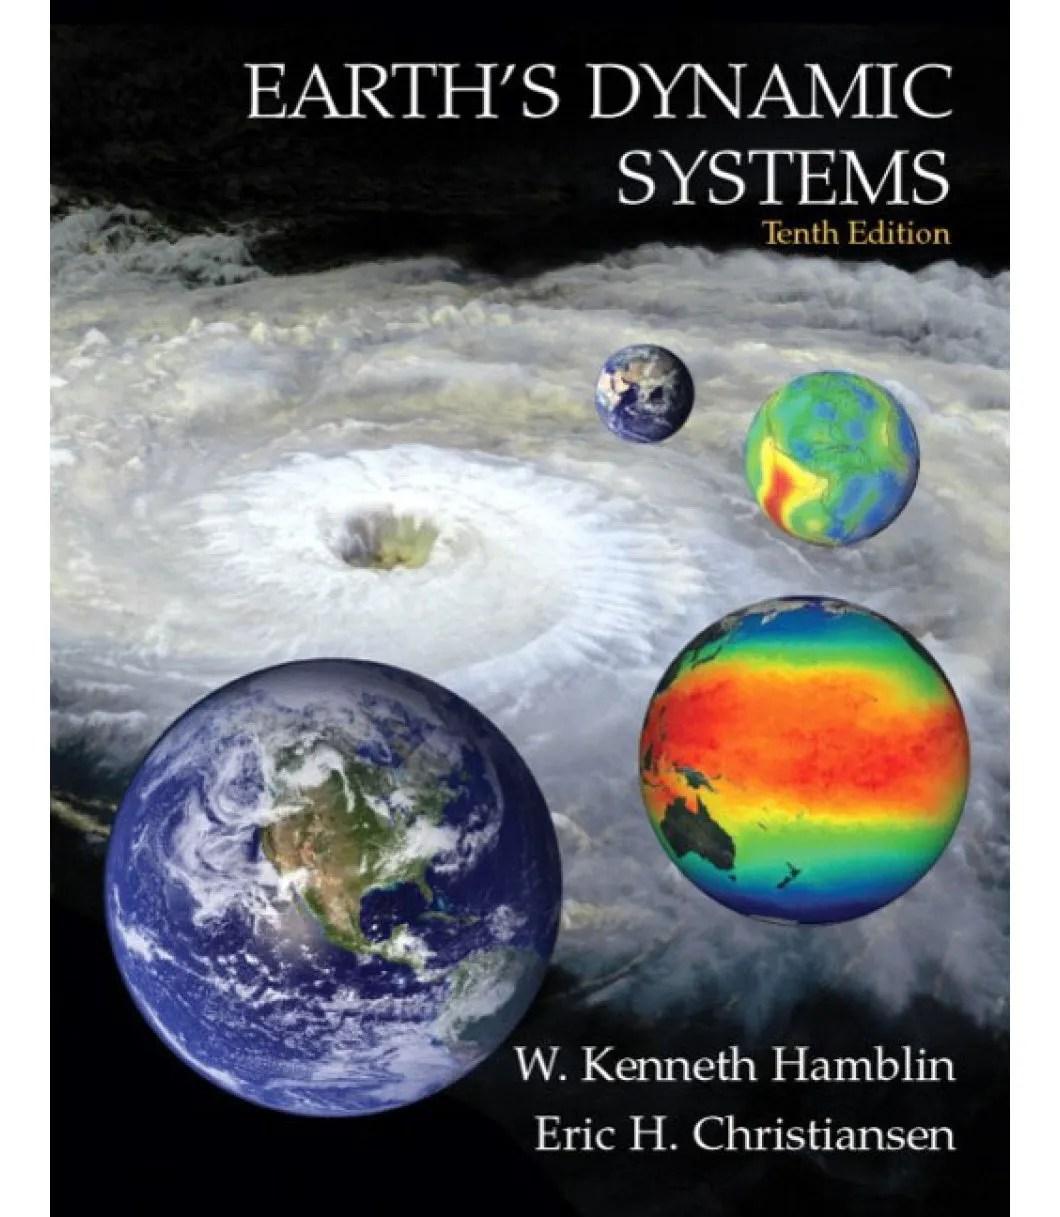 Earth S Dynamic Systems W Kenneth Hamblin And Eric H